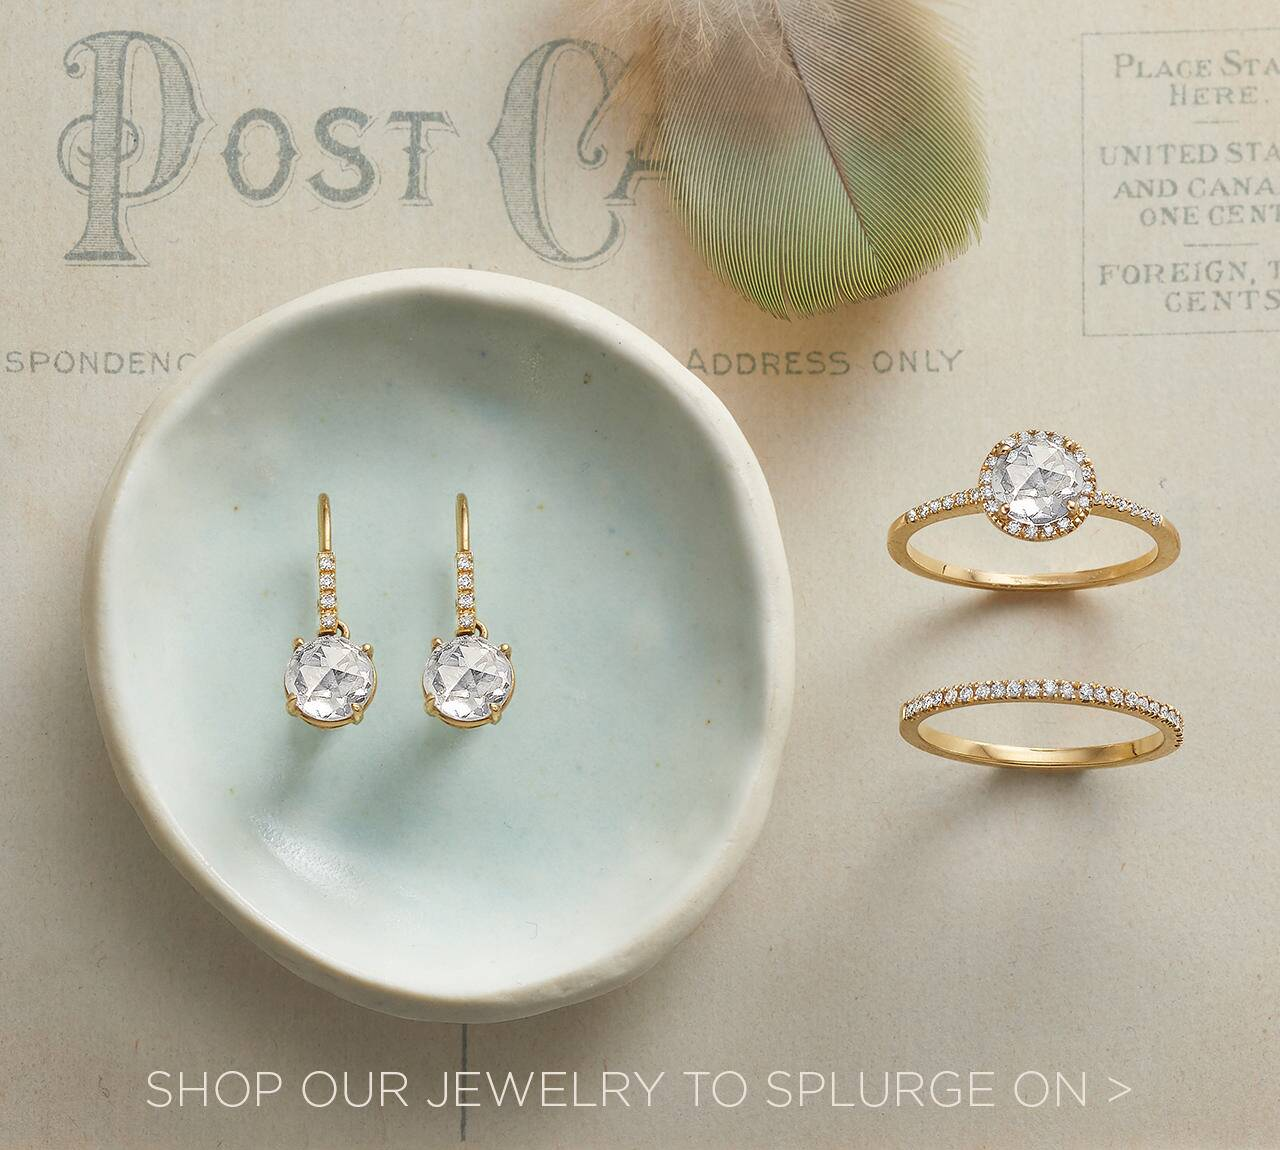 Jewelry to Splurge On